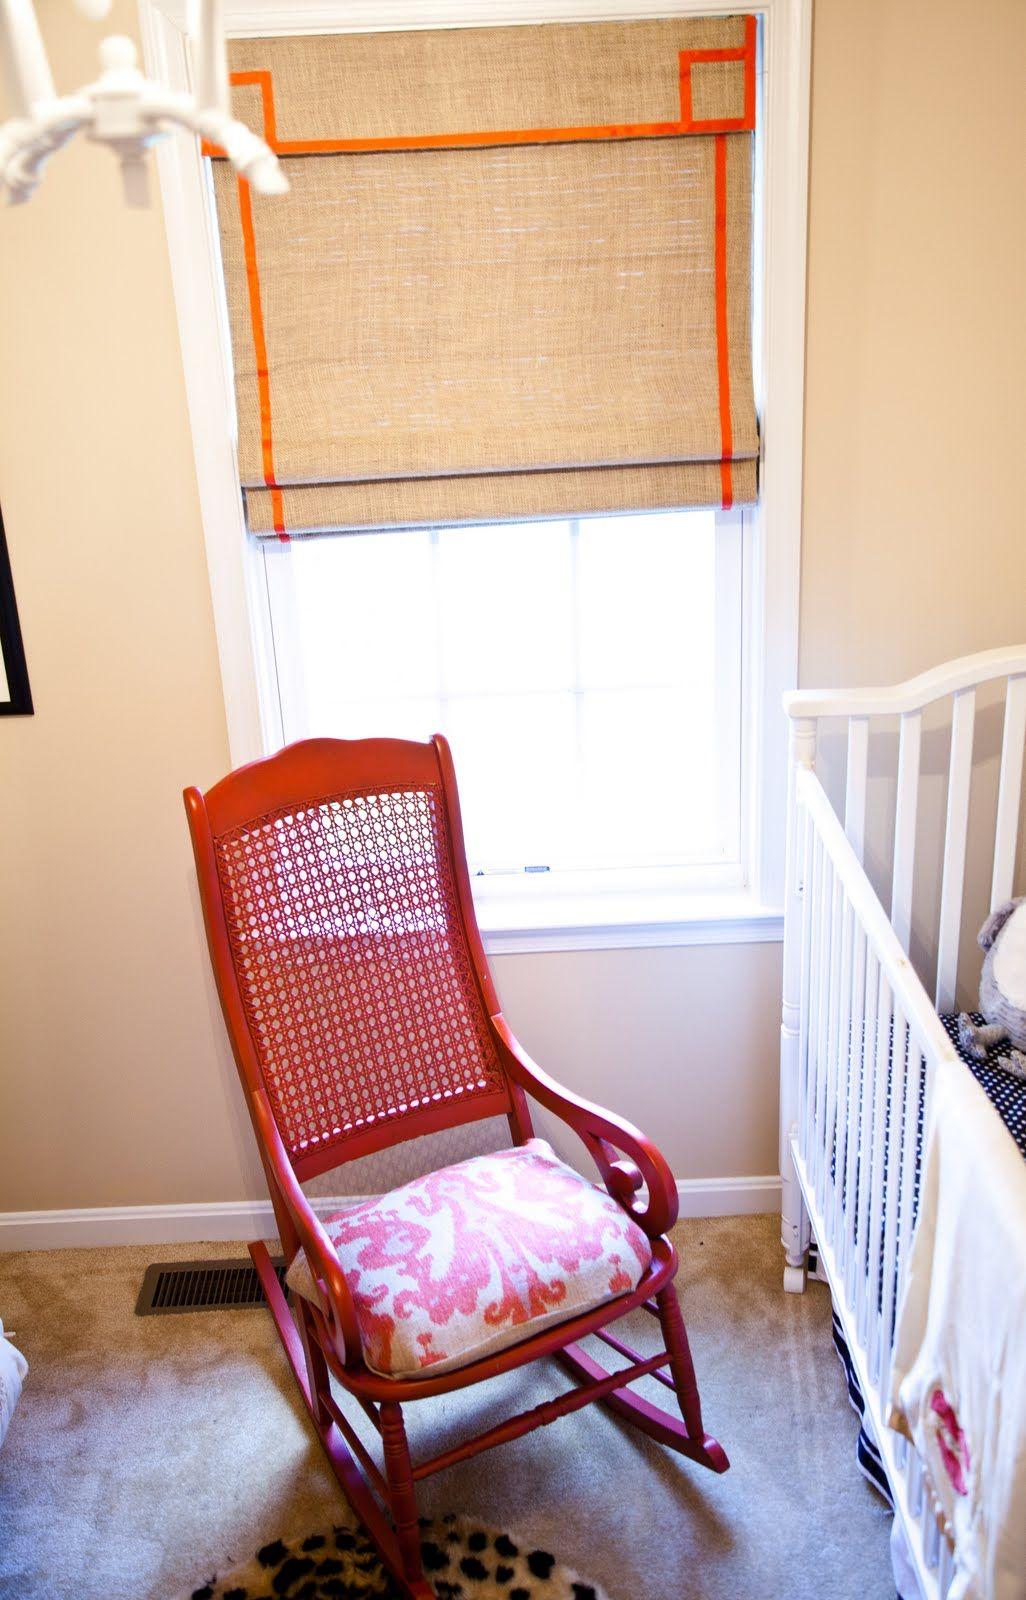 Diy Roman Chair For Restaurant Johns Journal Burlap Shade With Tutorial